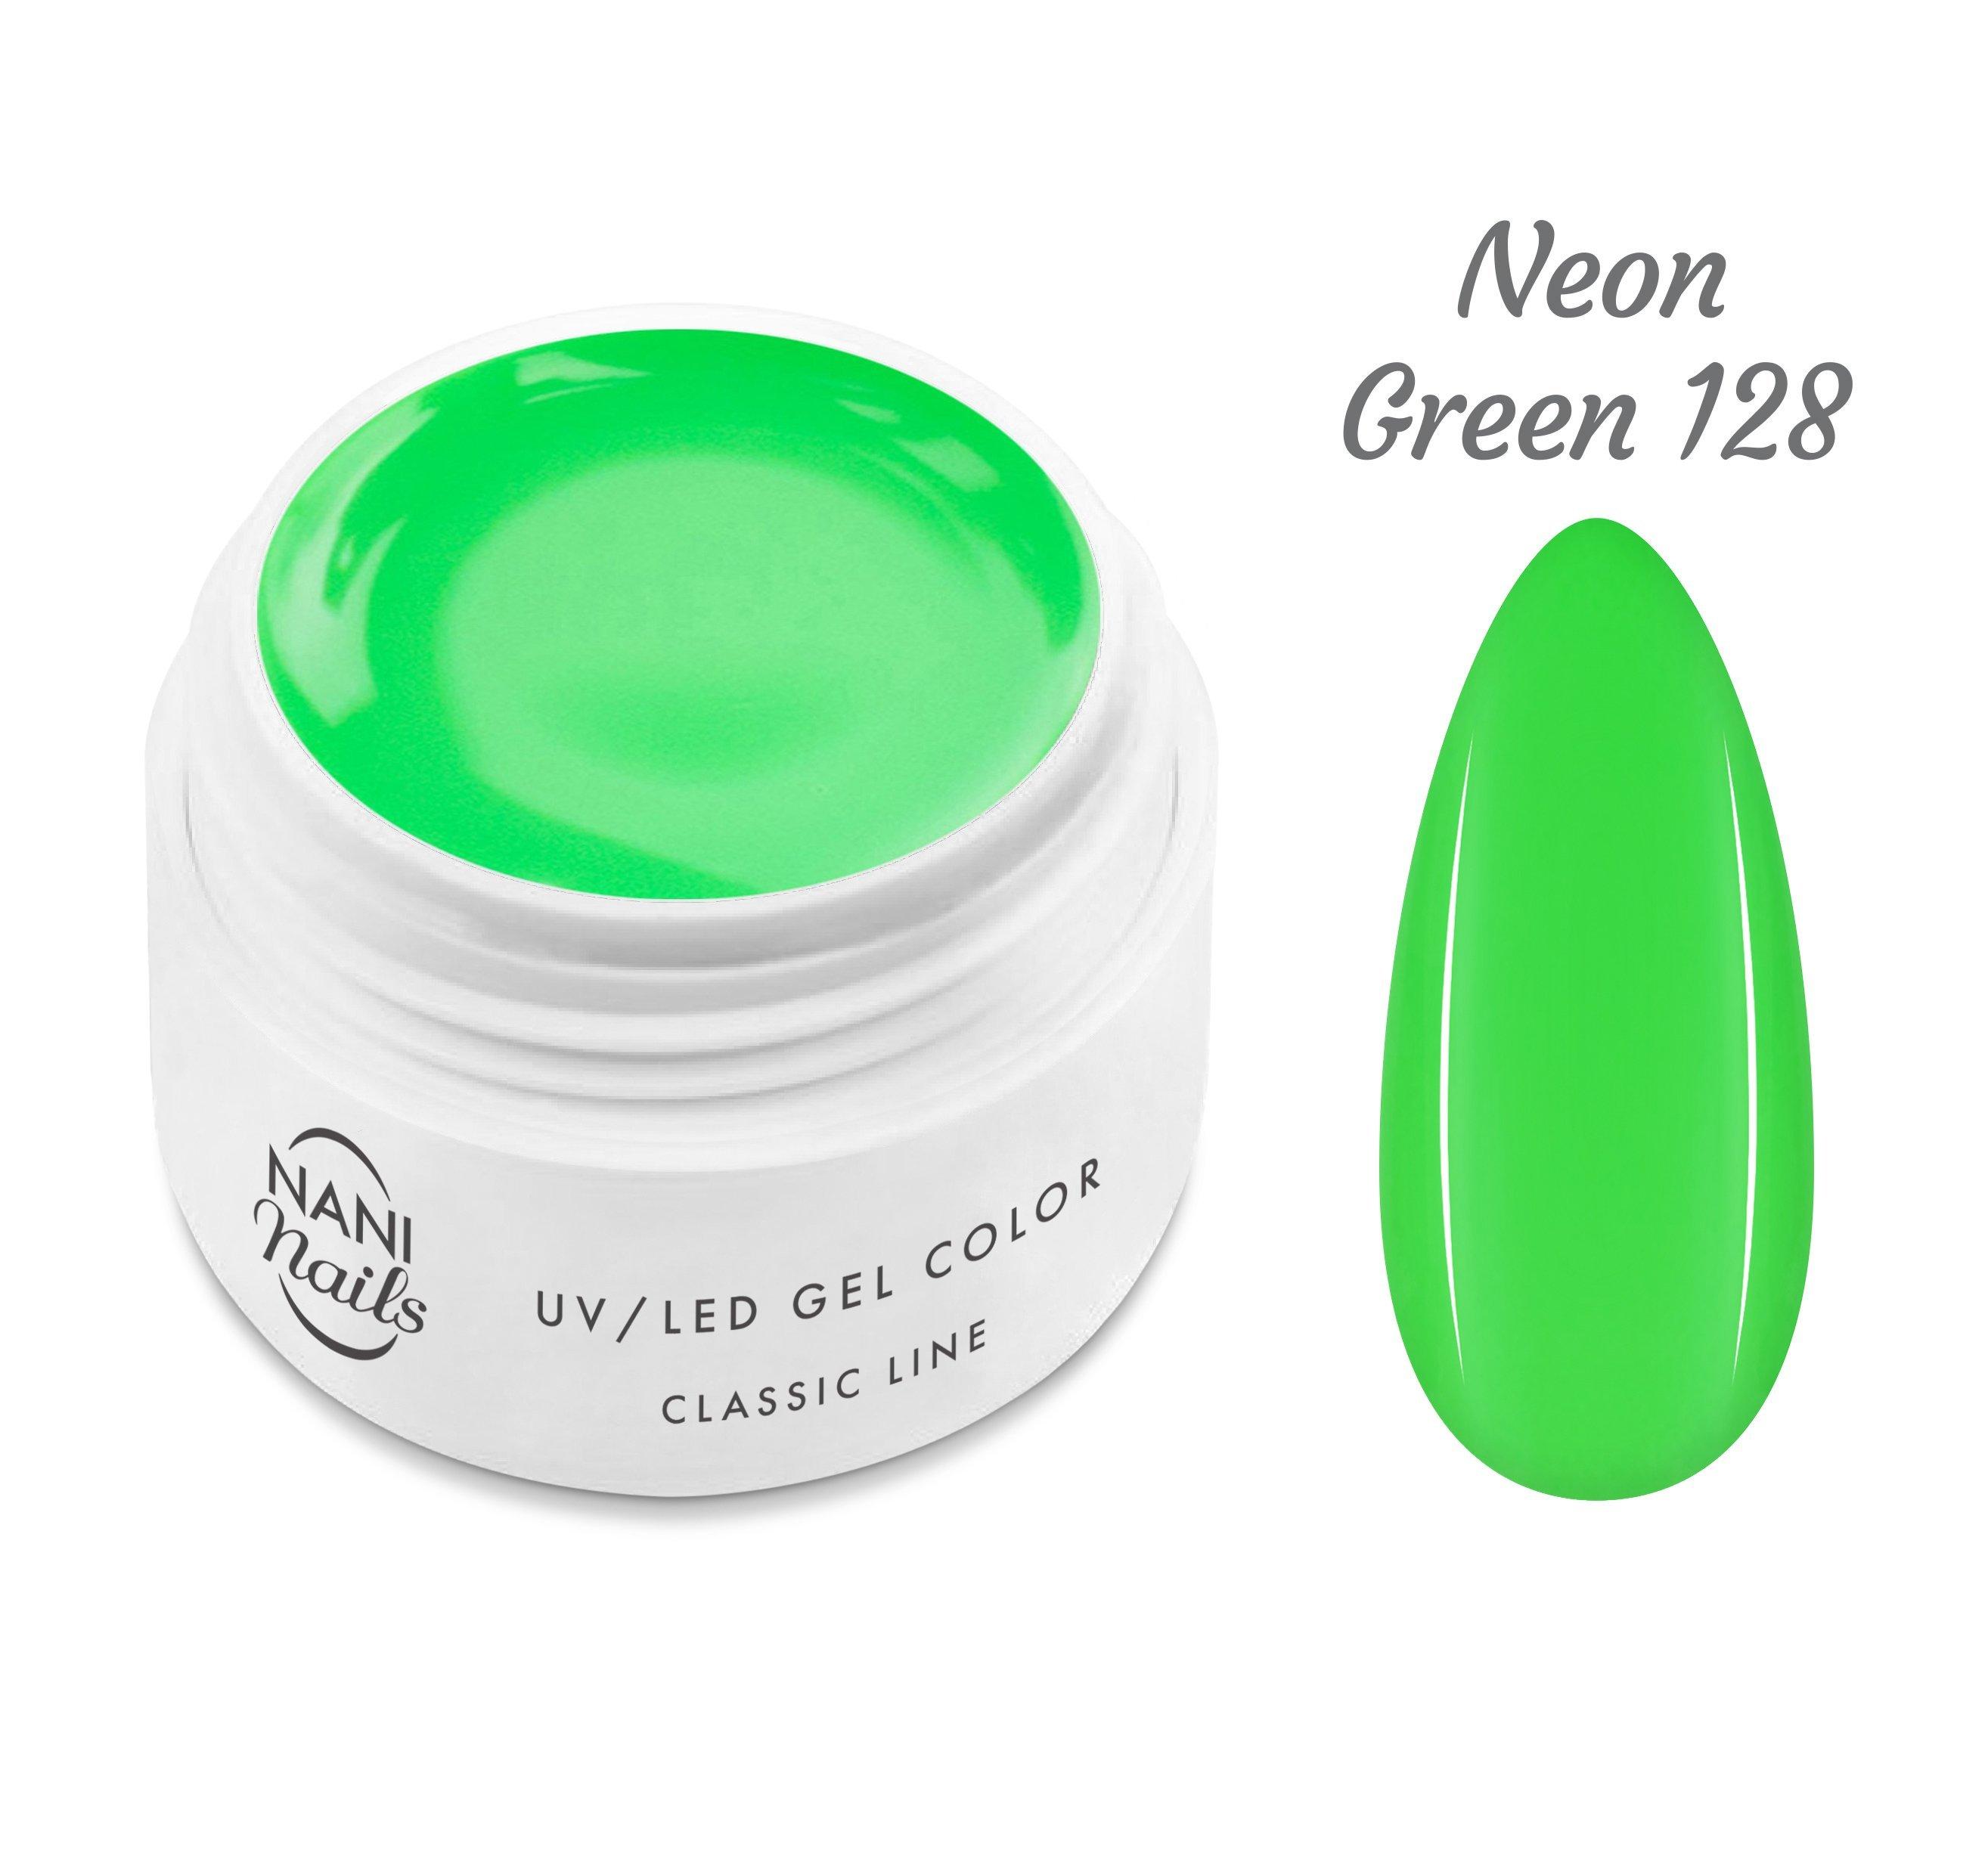 NANI UV gél Classic Line 5 ml - Neon Green